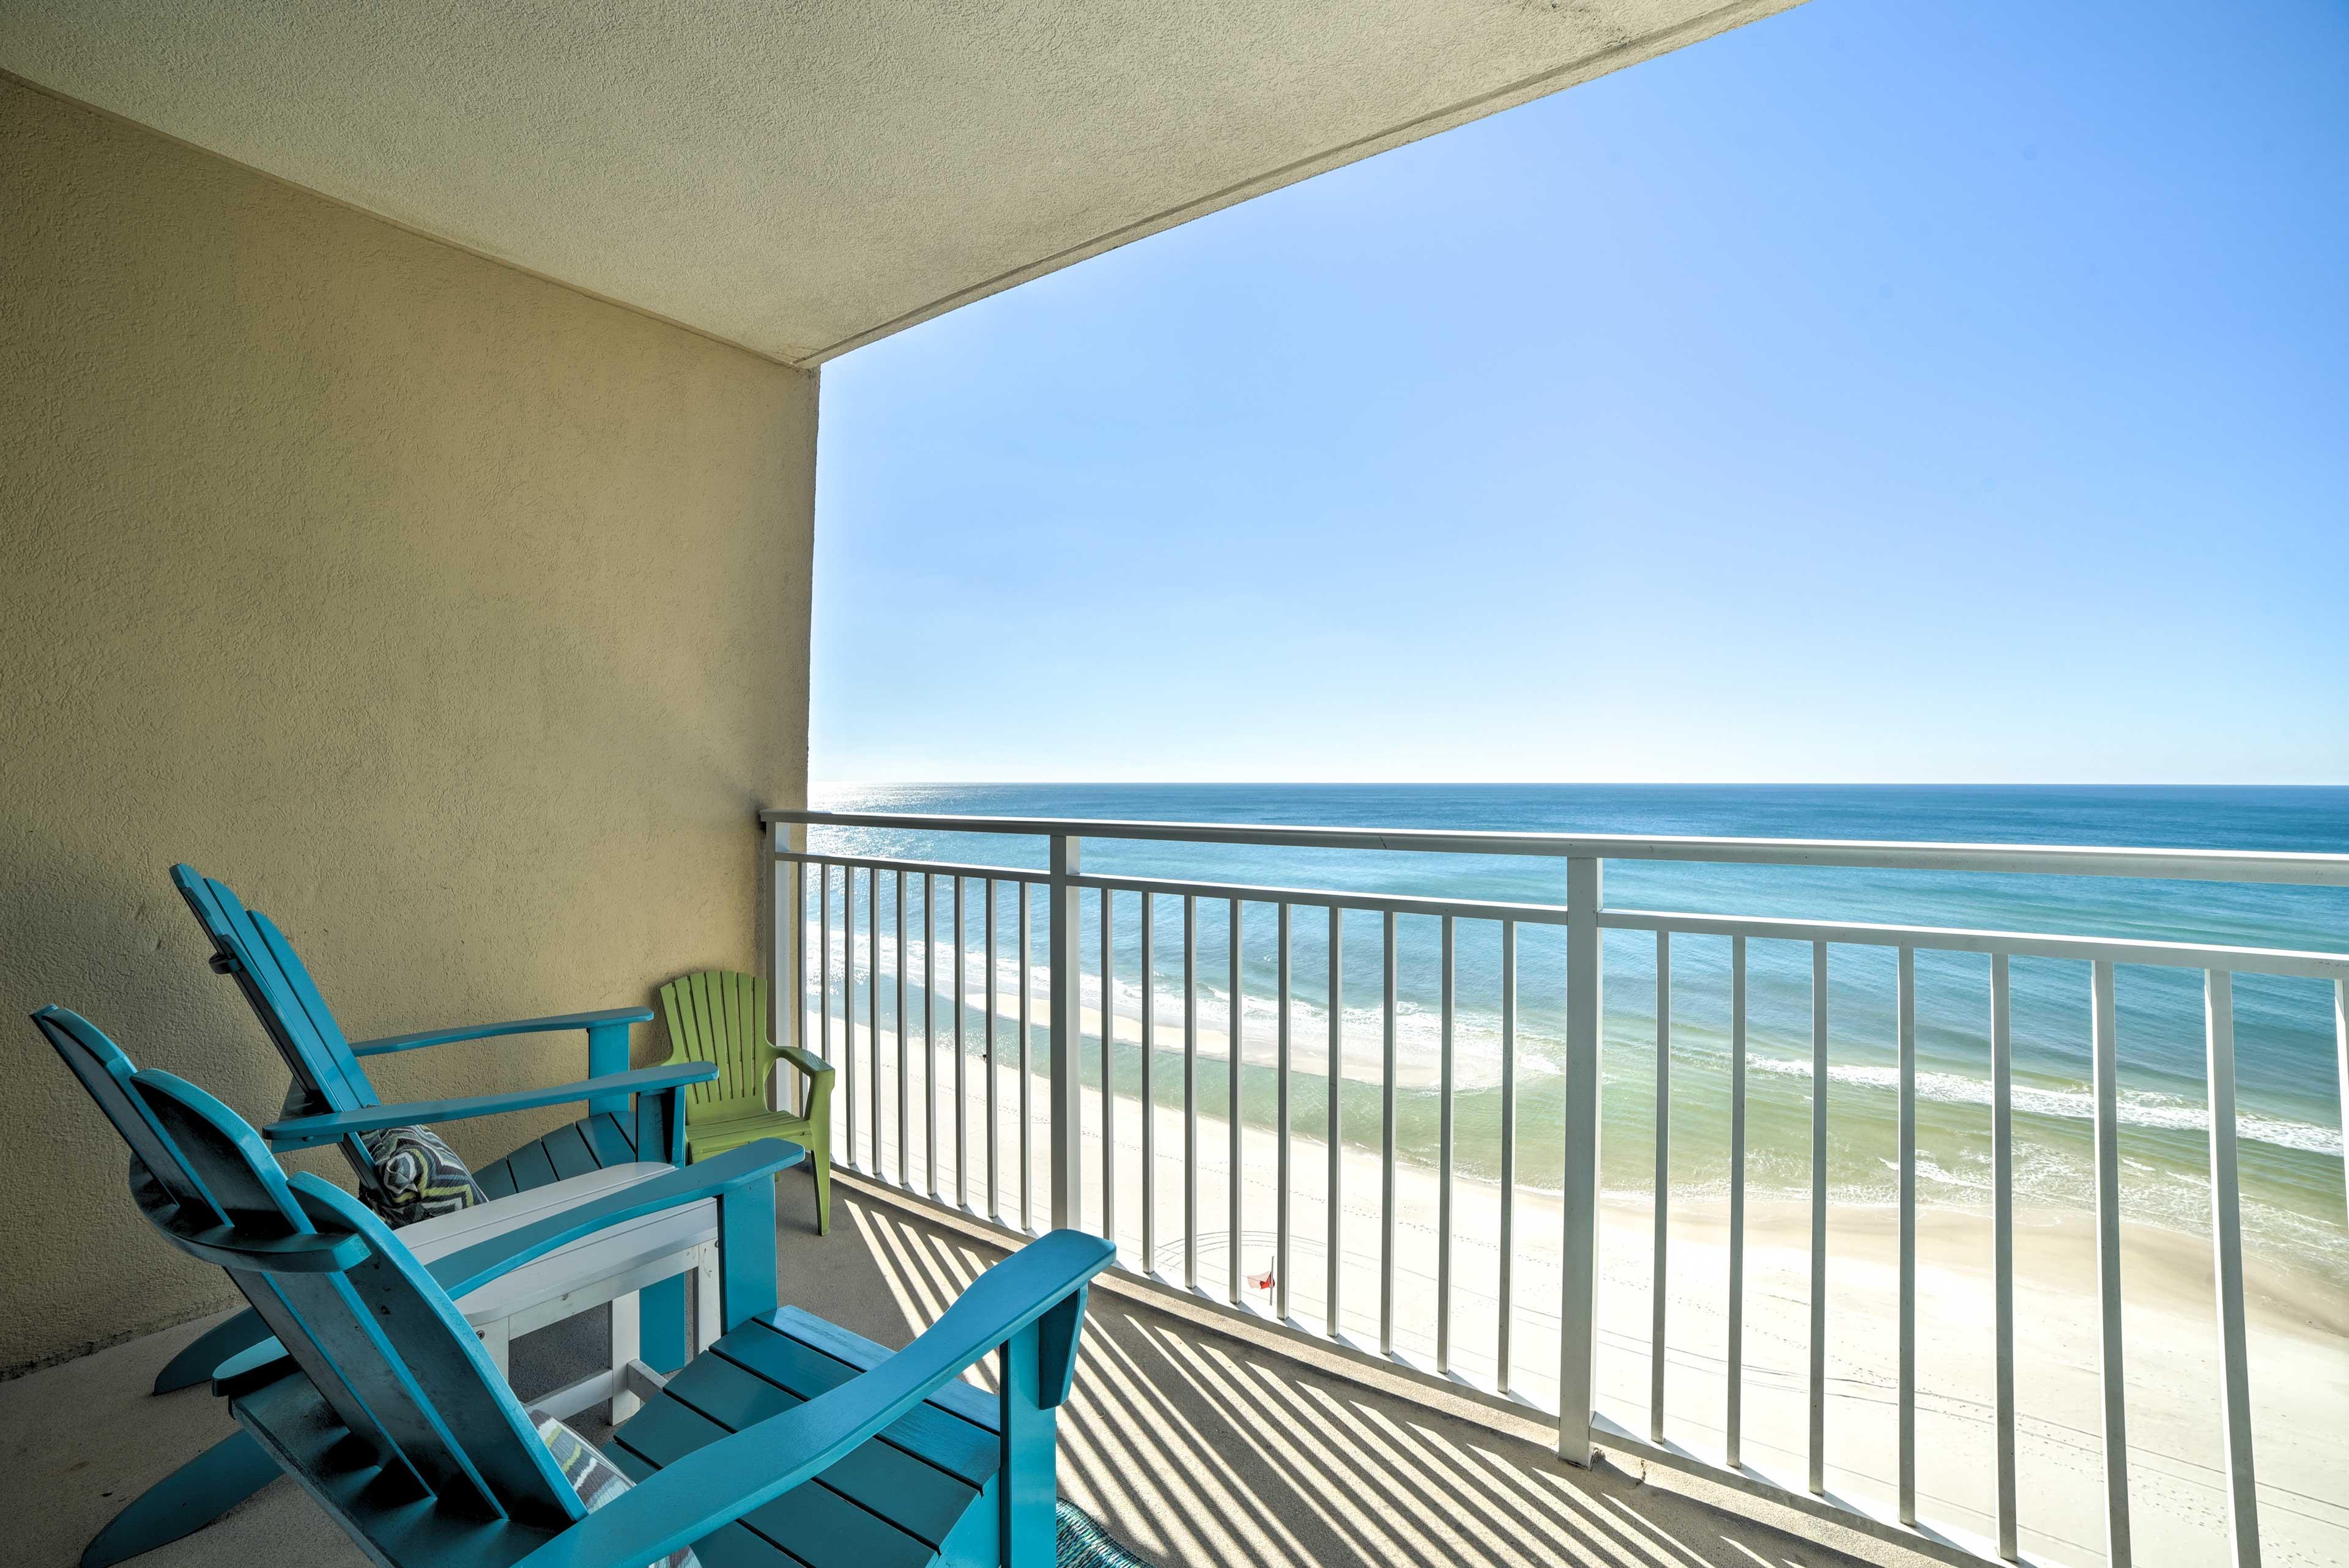 Panama City Beach Vacation Rental Condo | 1BR | 1BA | 800 Sq Ft